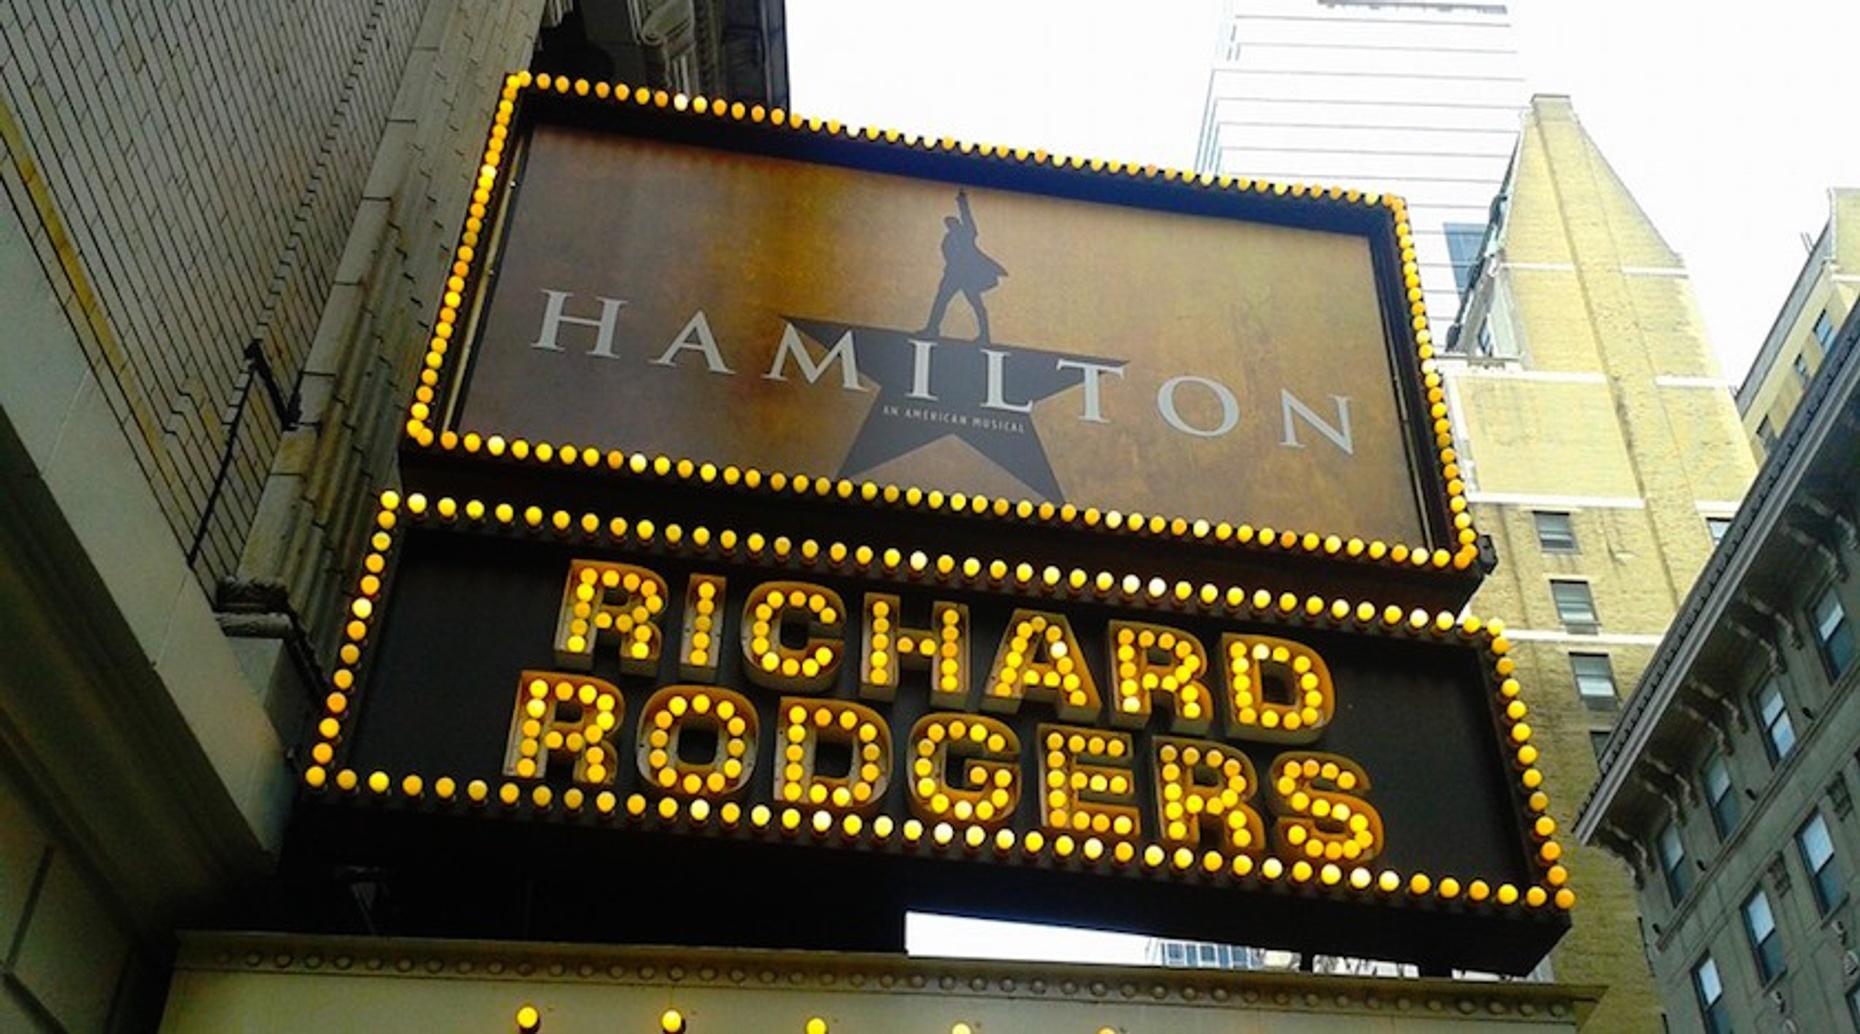 Gilbert & Sullivan To Hamilton Downtown Musical Theatre Walking Tour